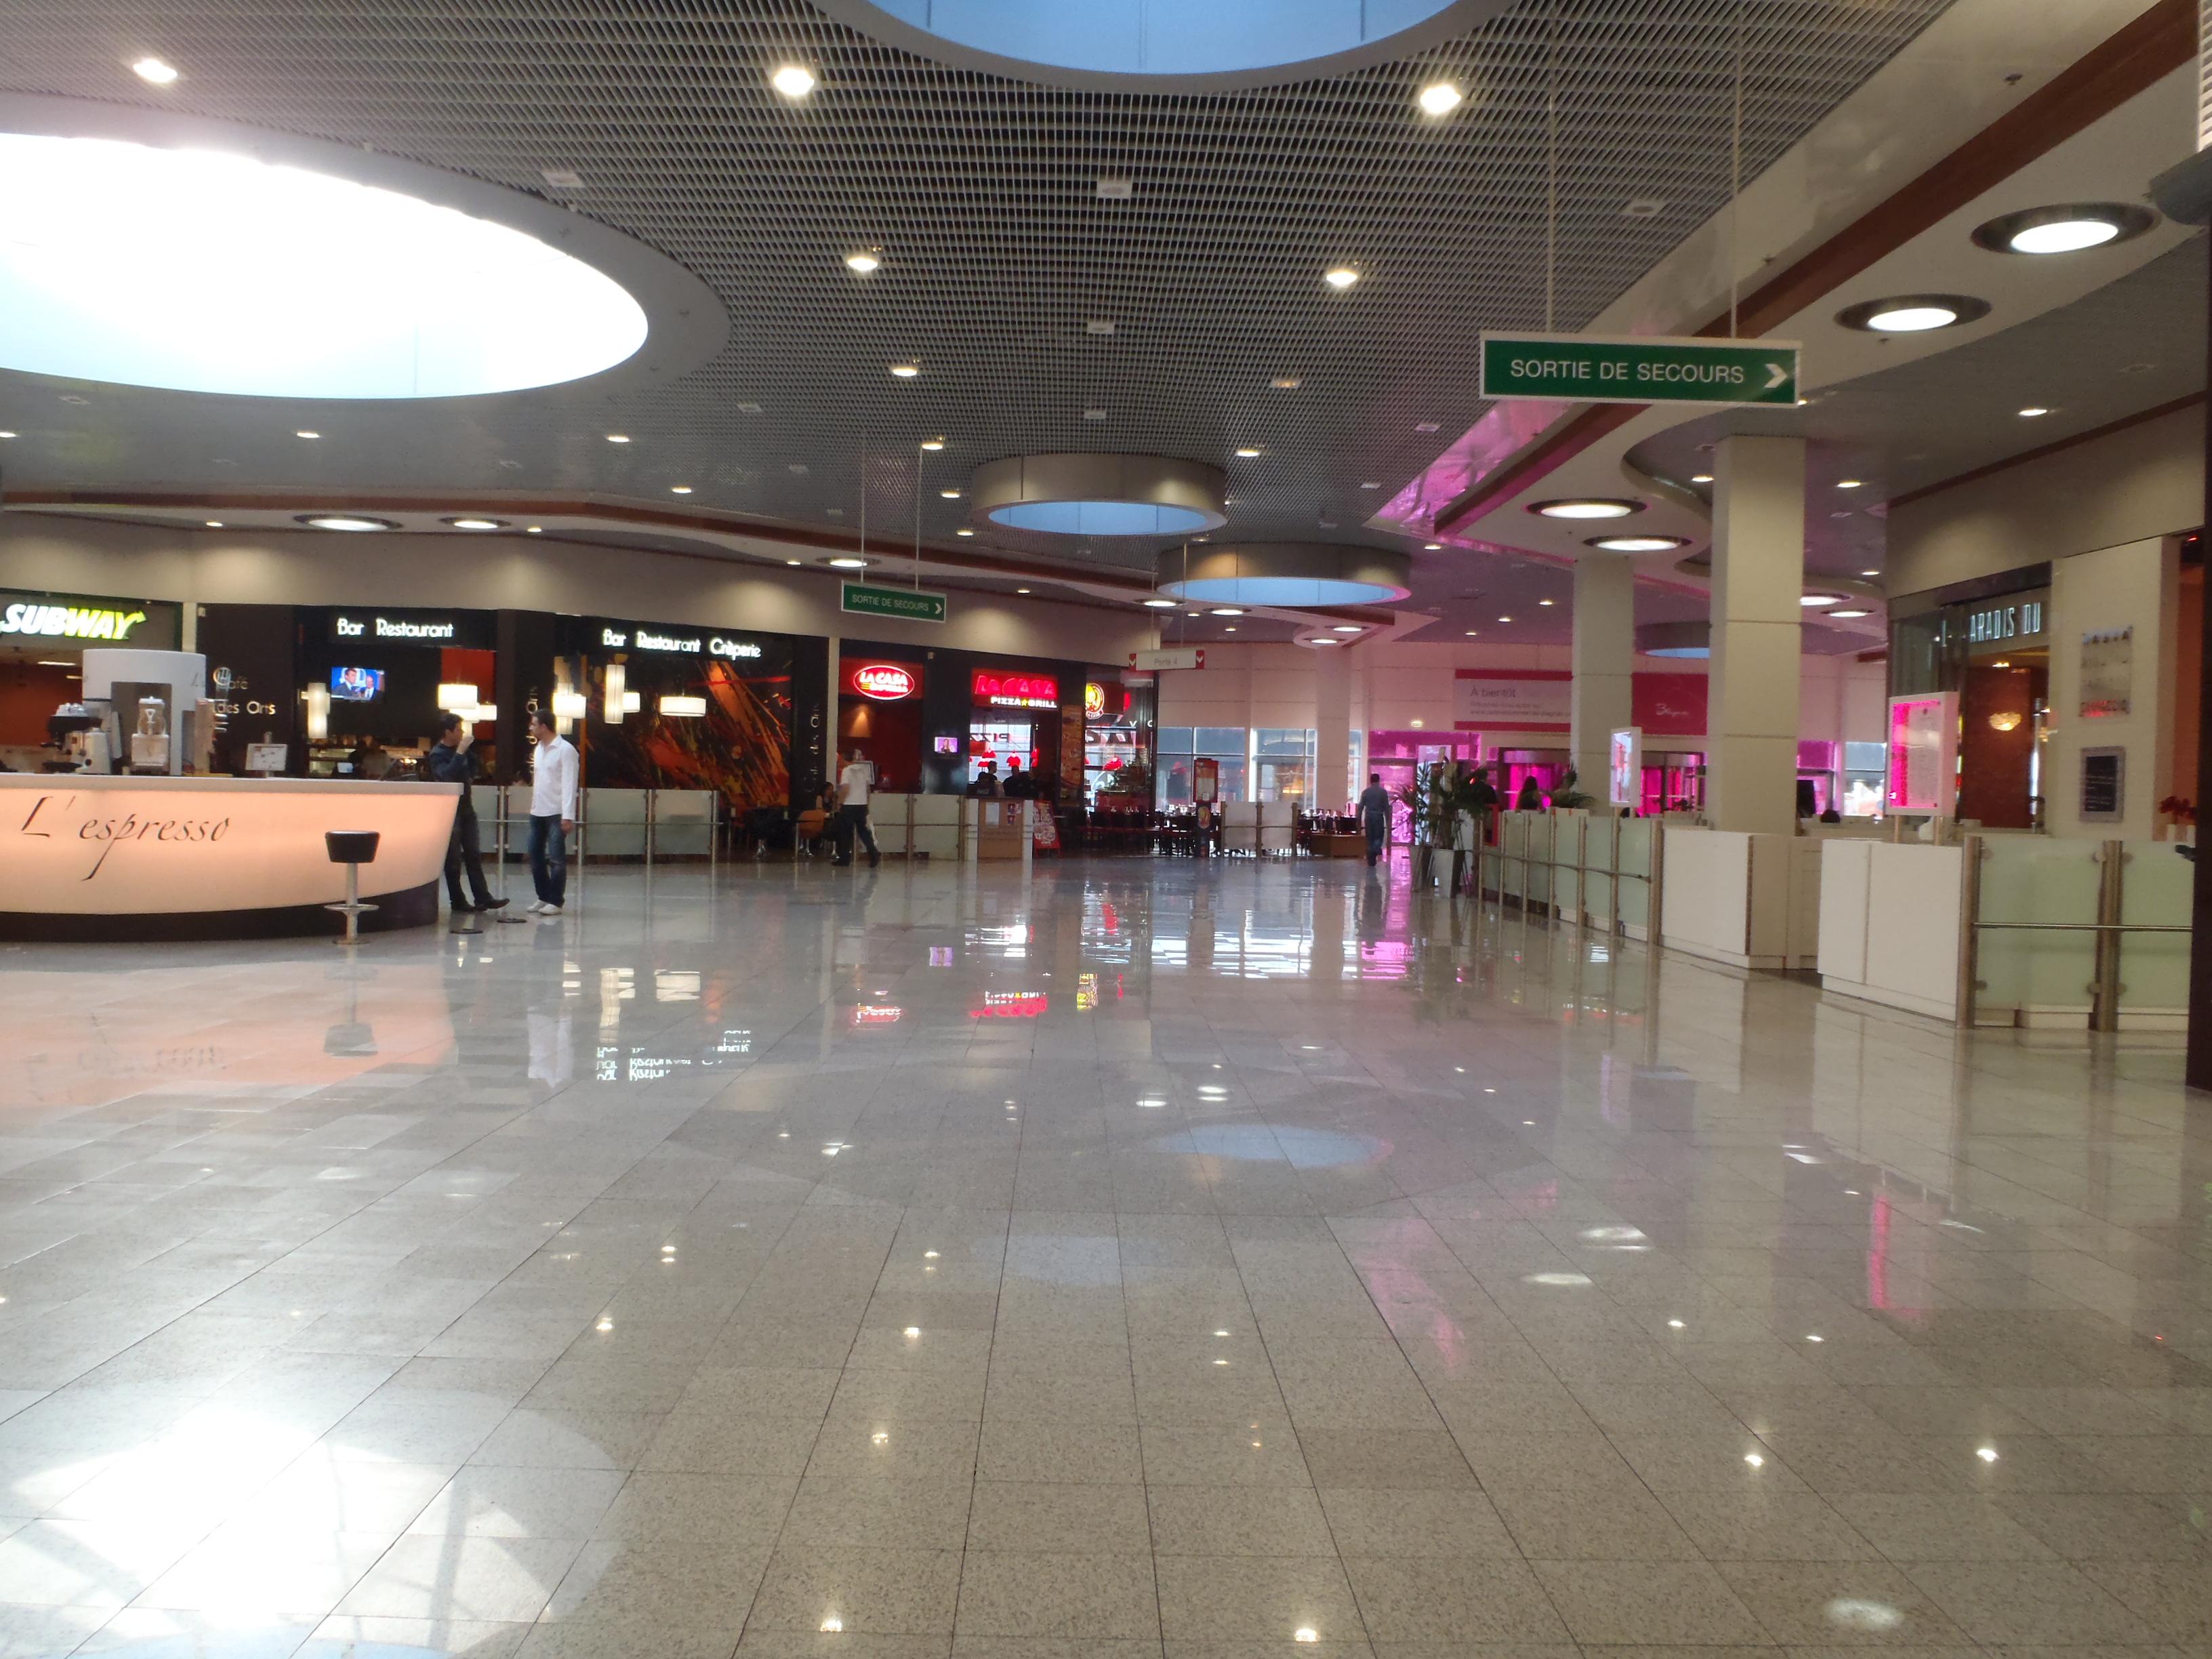 Centre commercial blagnac barbanel - Centre commercial daumesnil ...